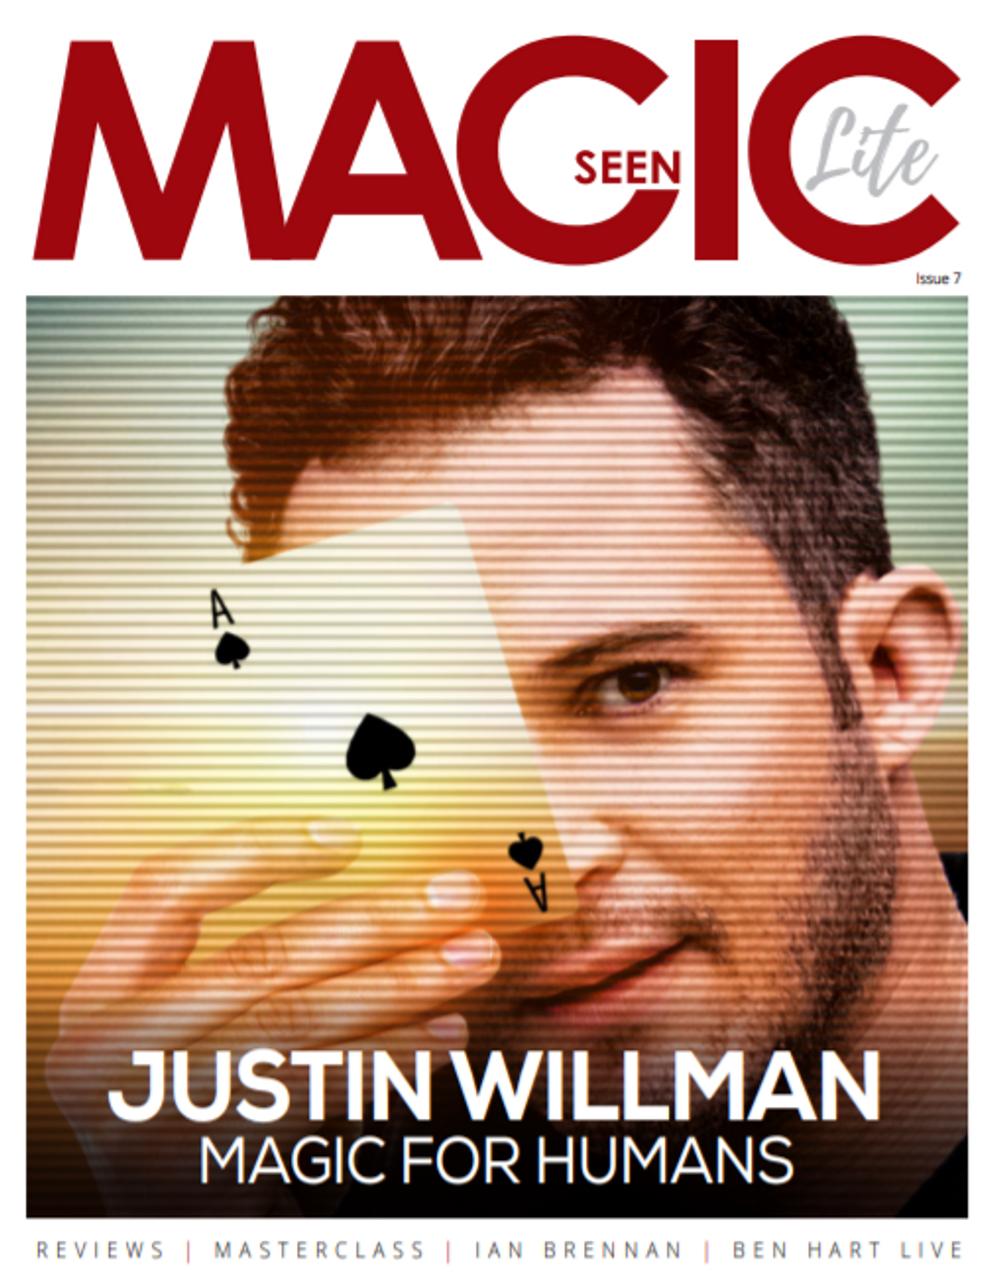 Magicseen Lite Issue 7 Magazine